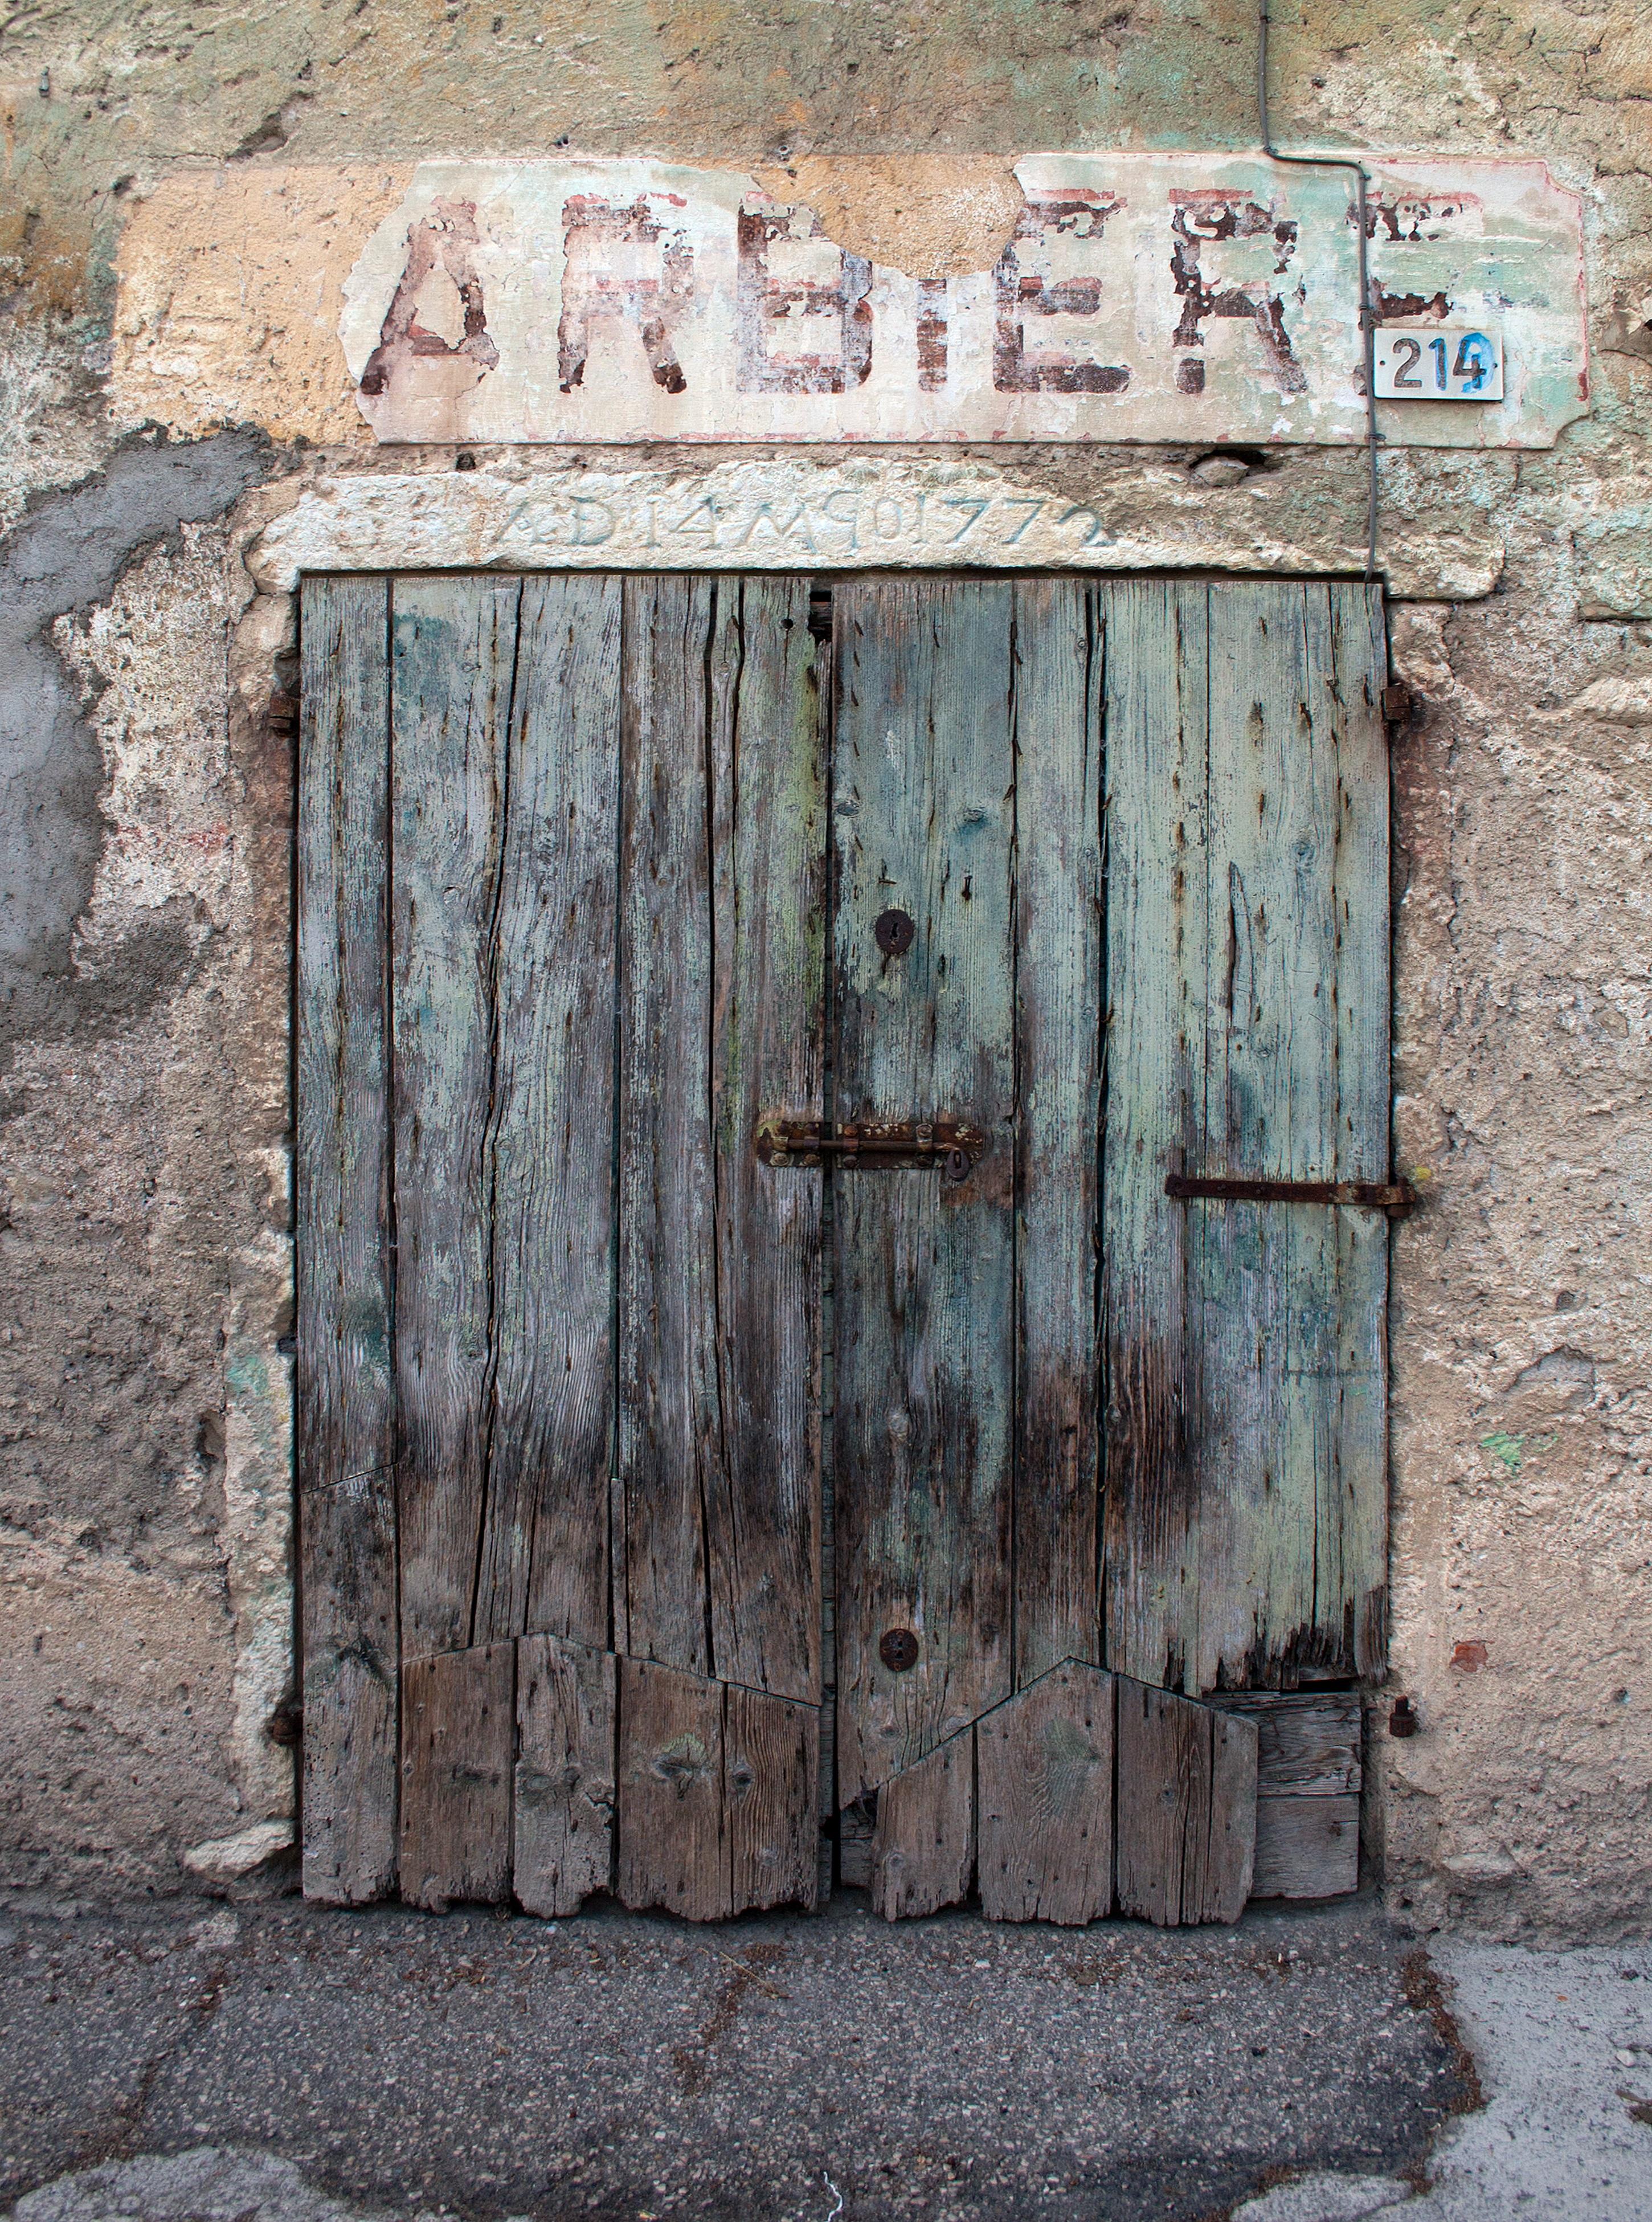 Old barber shop window - Wood Retro House Window Old Wall Blue Brick Door Doorway Dilapidated Barber Shop Urban Area Ancient